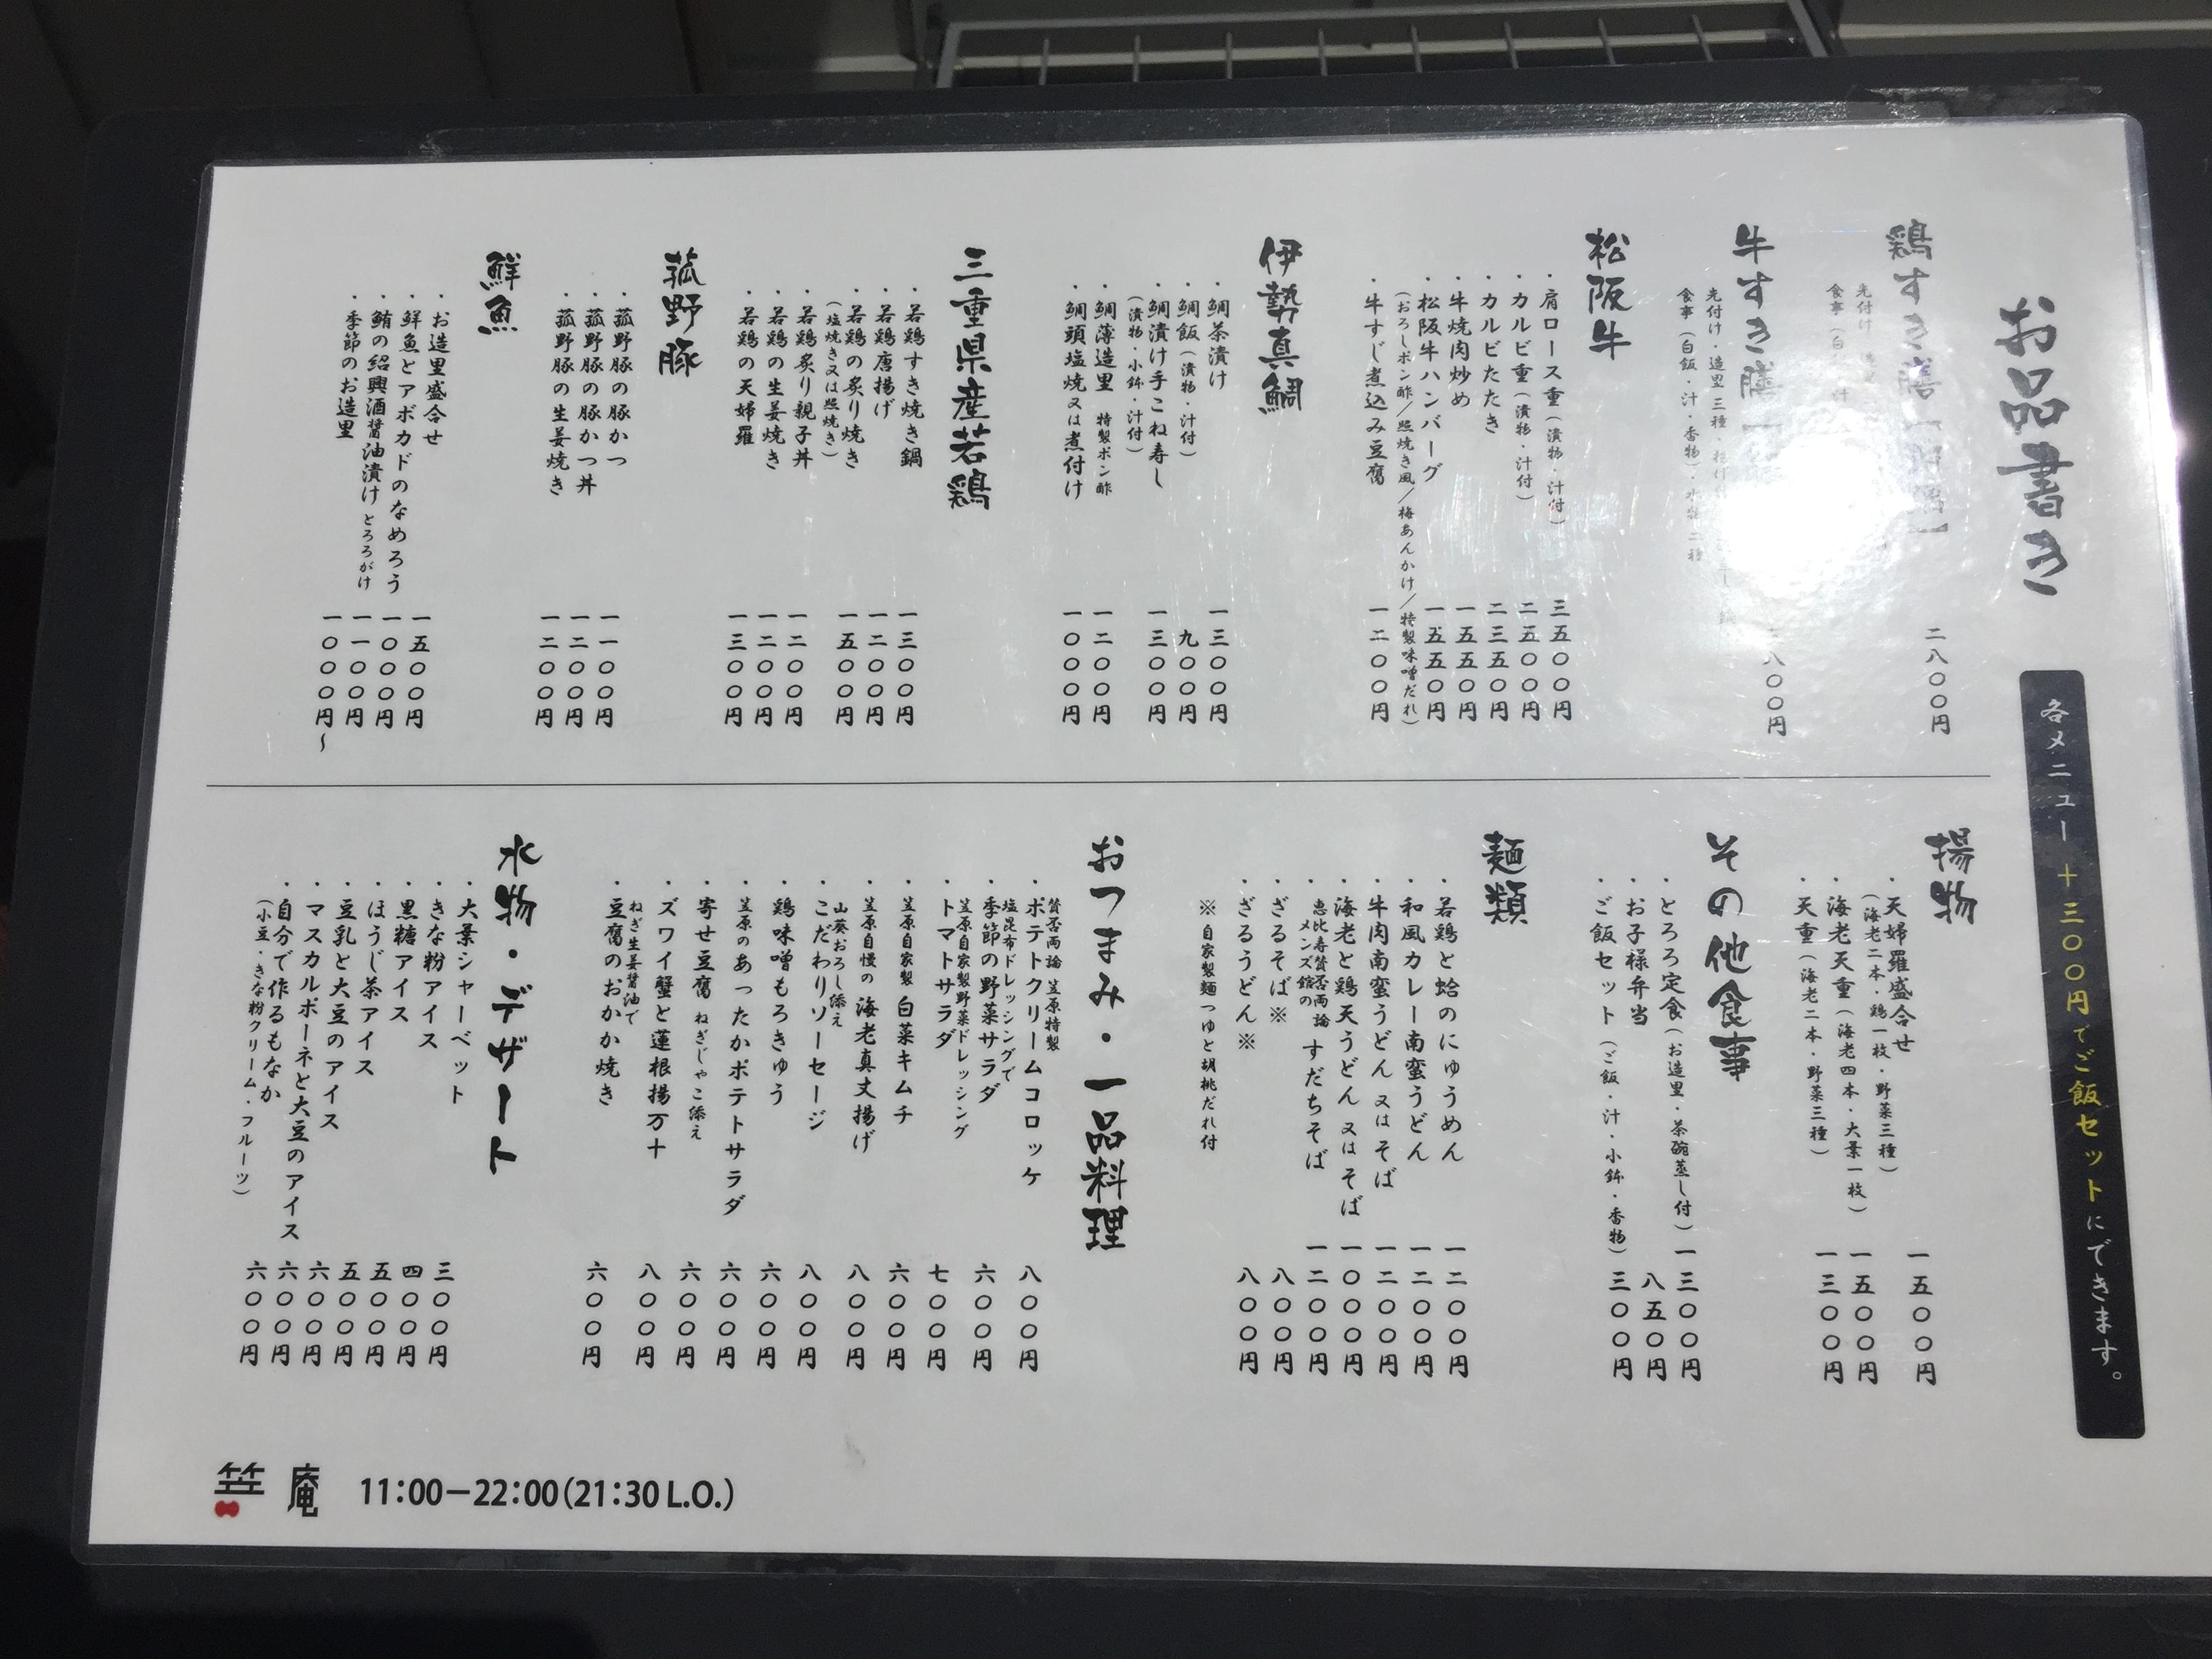 kasaan-sanpiryouron-menu